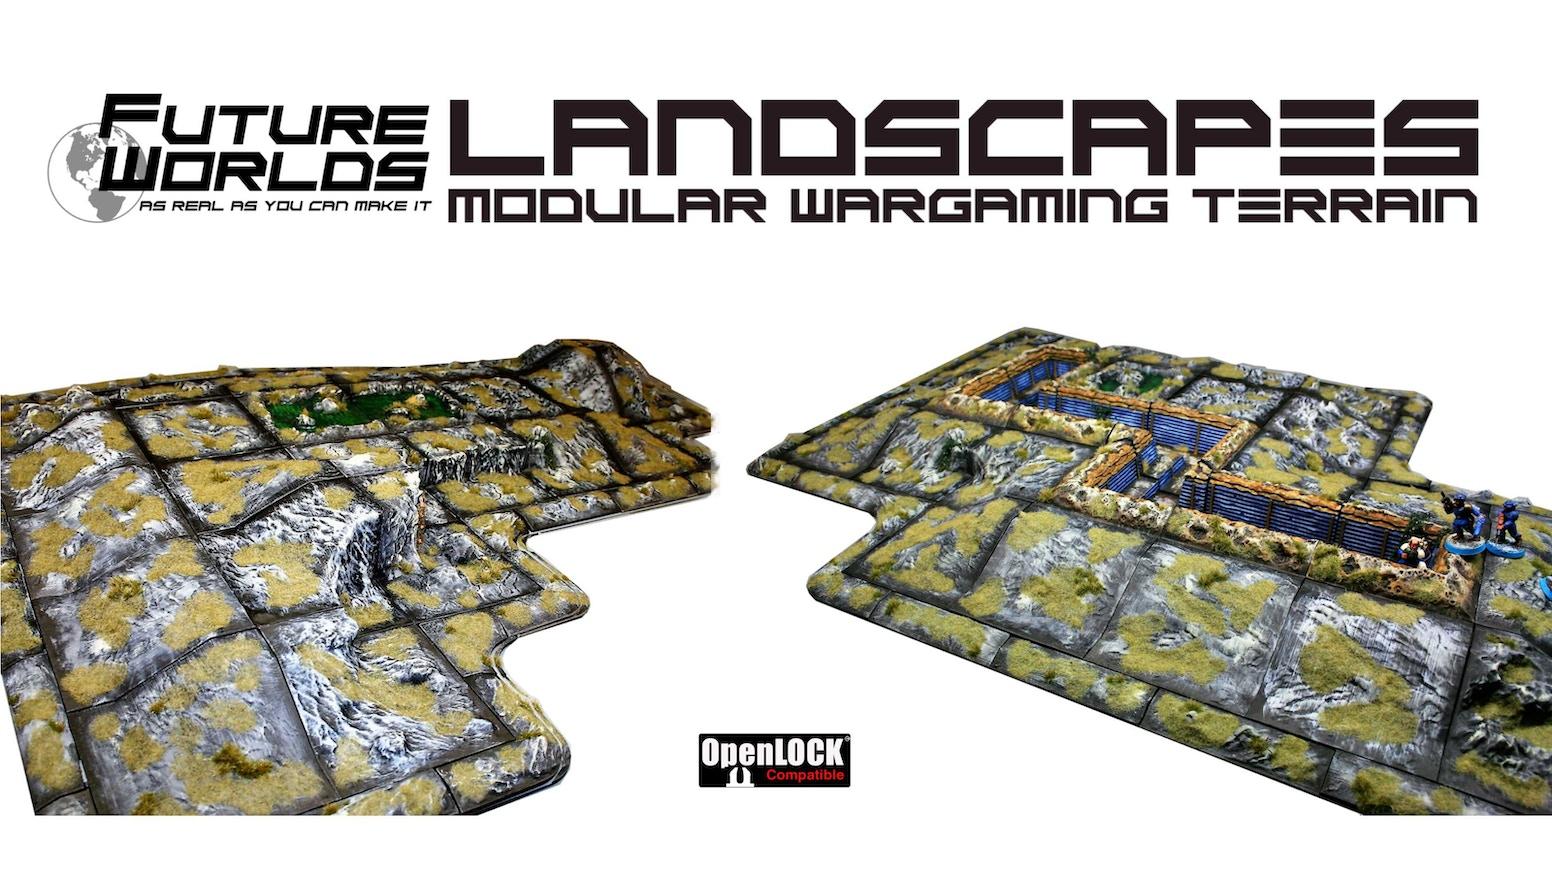 Future Worlds: Landscapes - modular war game terrain by Nick Fatchen